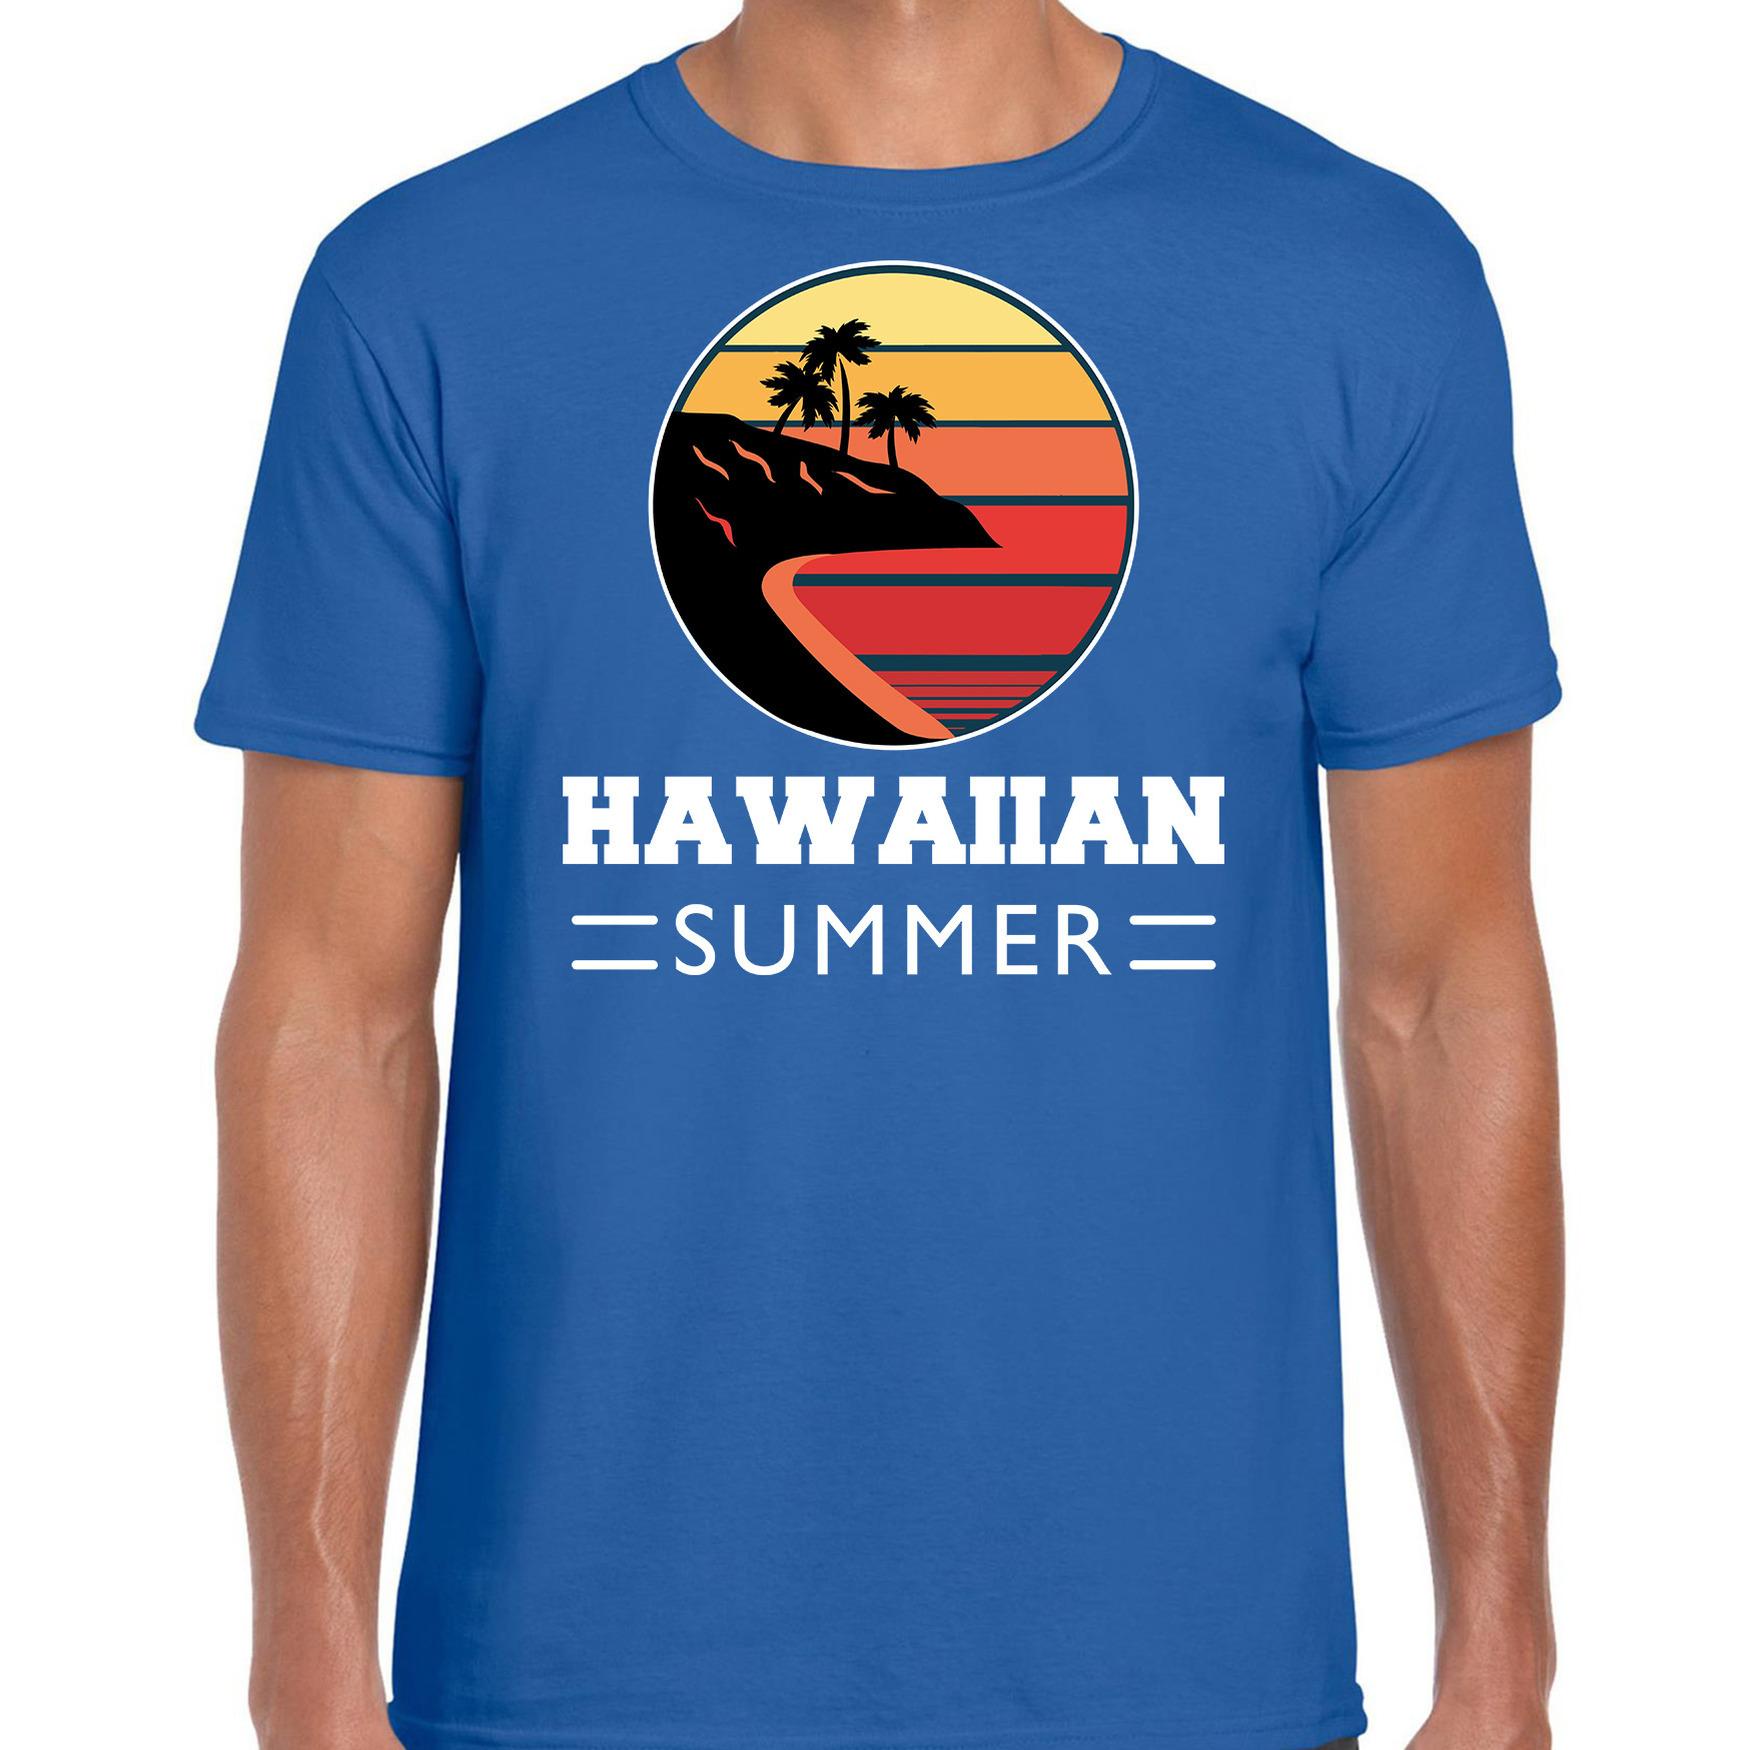 Hawaiian summer shirt beach party - strandfeest outfit - kleding blauw voor heren